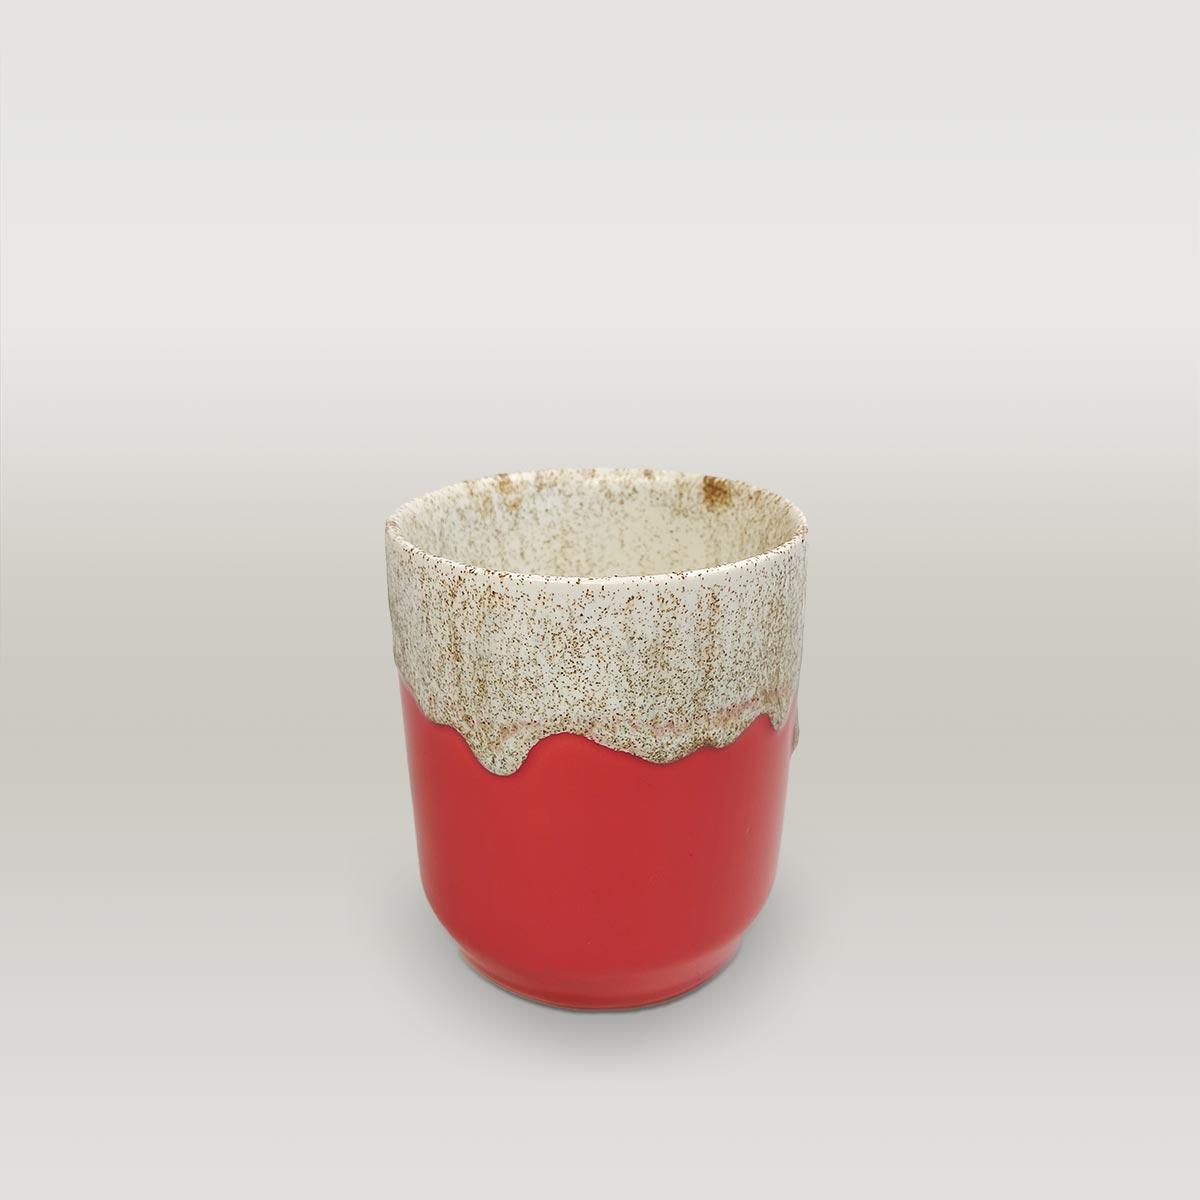 Molecule's Classic Red White Mug 1